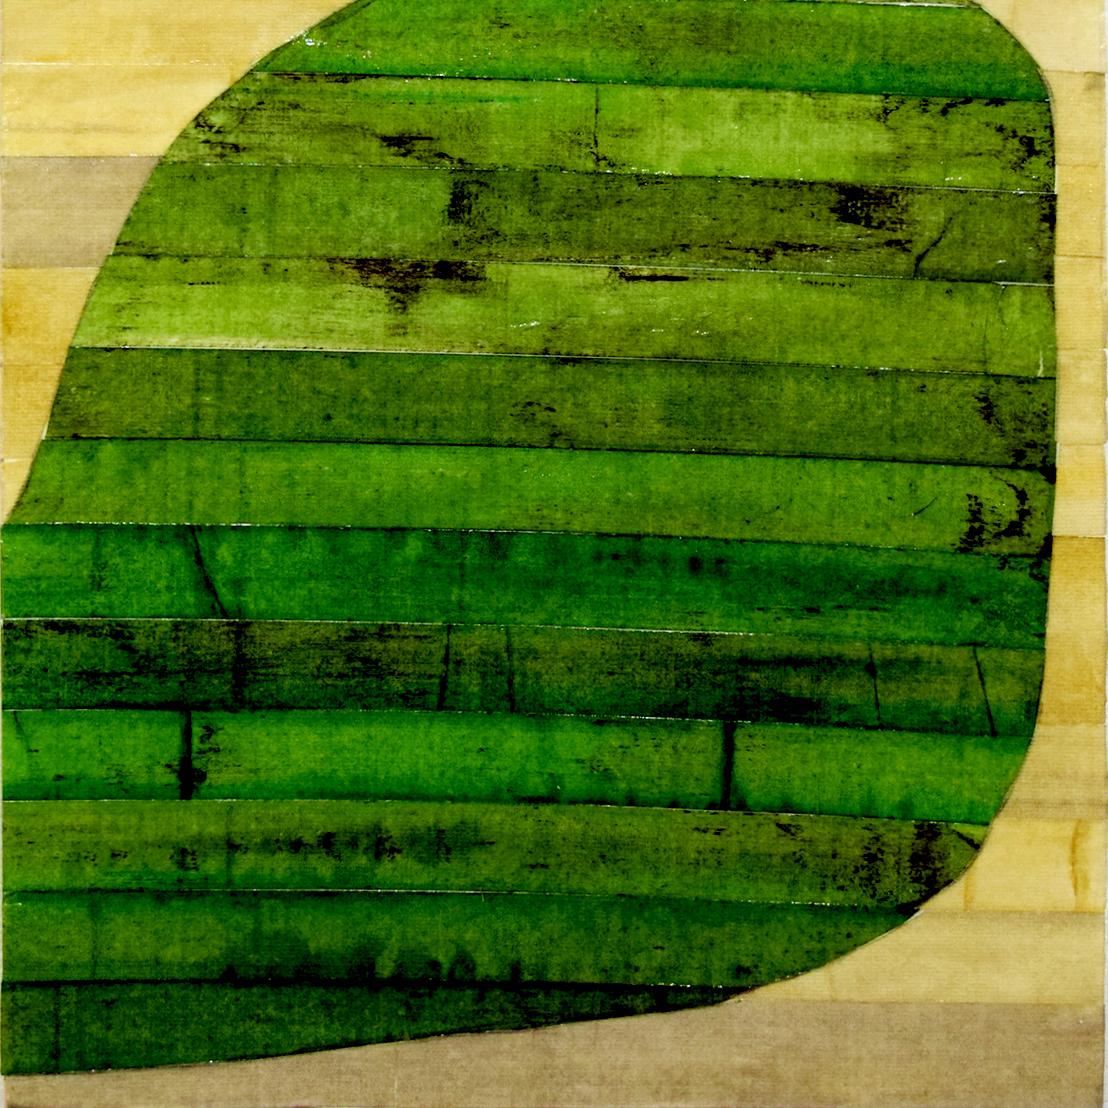 web_Watercolor Art_1aS ICON.jpg